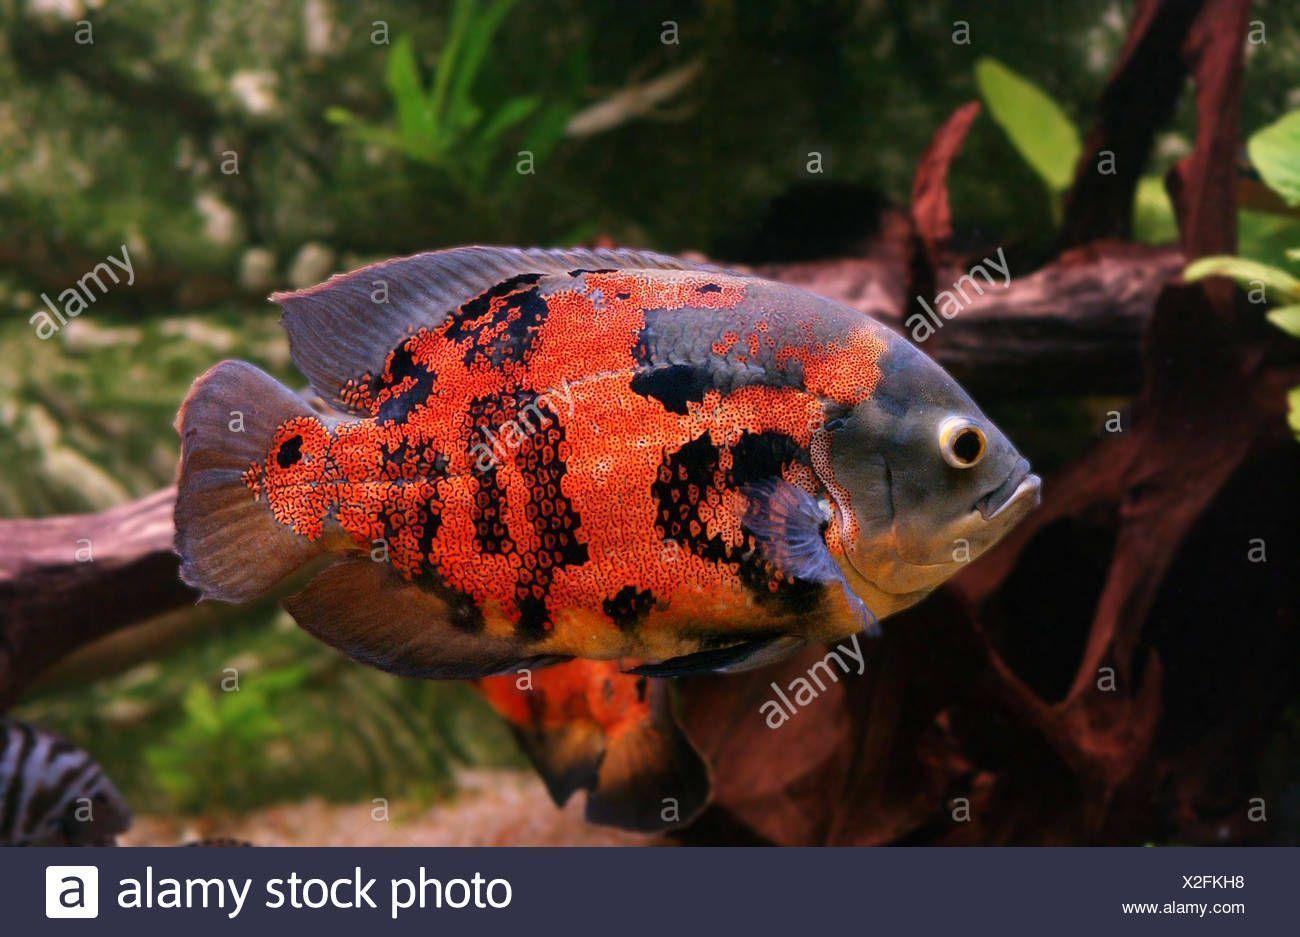 Adult oscar fish